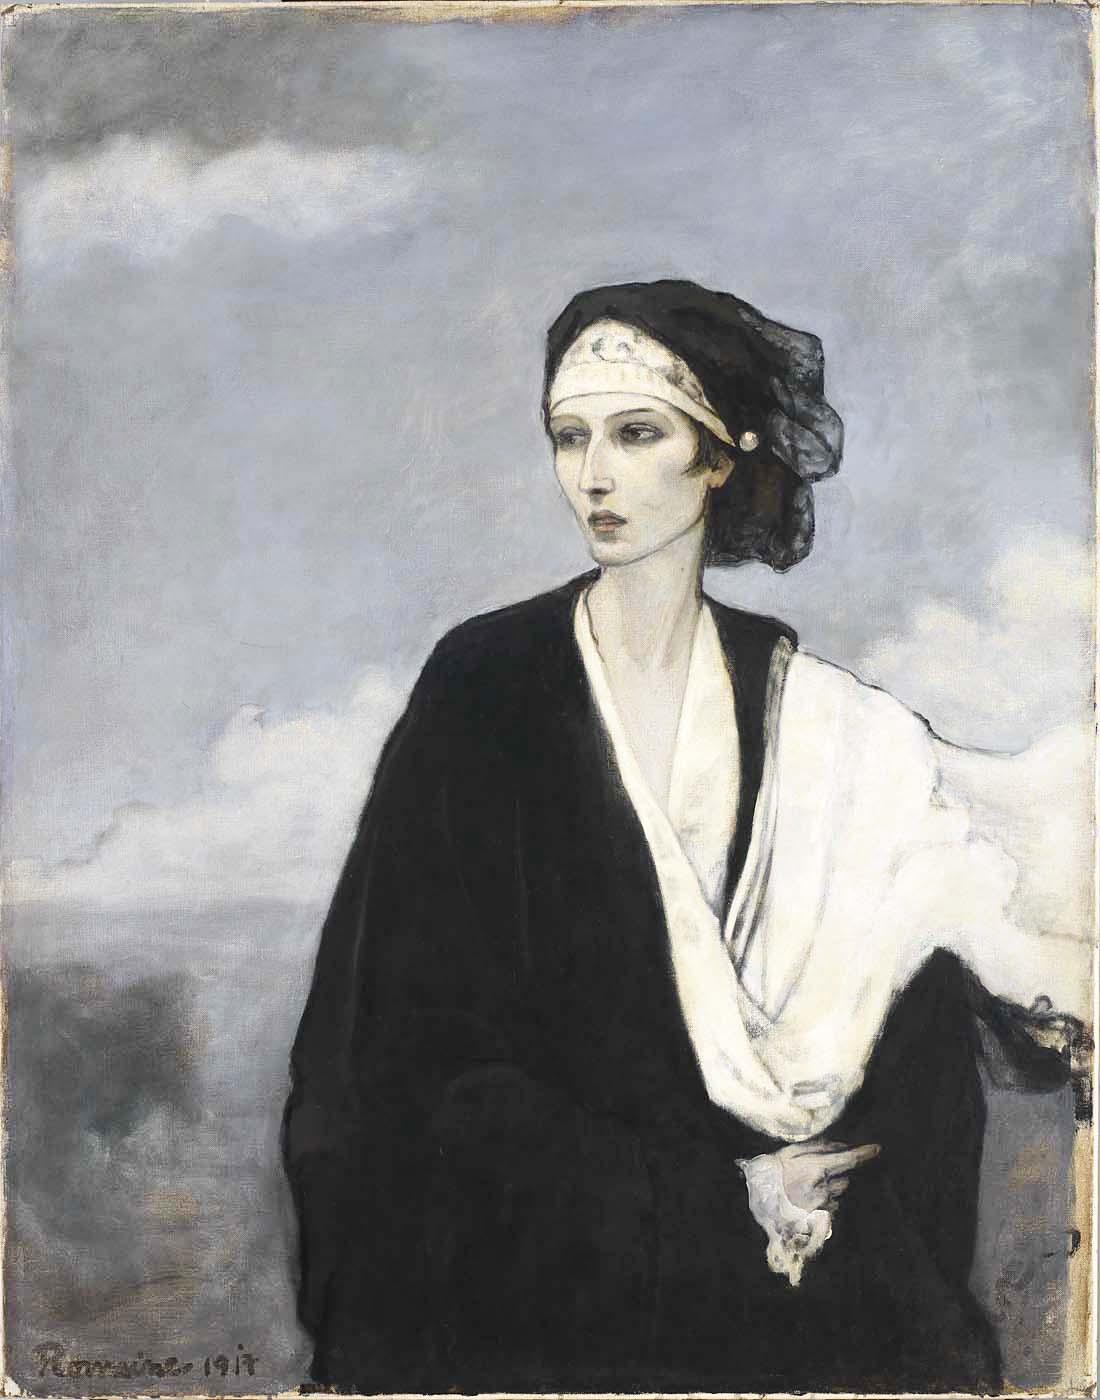 ROMAINE BROOKS, IDA RUBINSTEIN , 1917, OIL ON CANVAS, COURTESY OF THE SMITHSONIAN AMERICAN ART MUSEUM